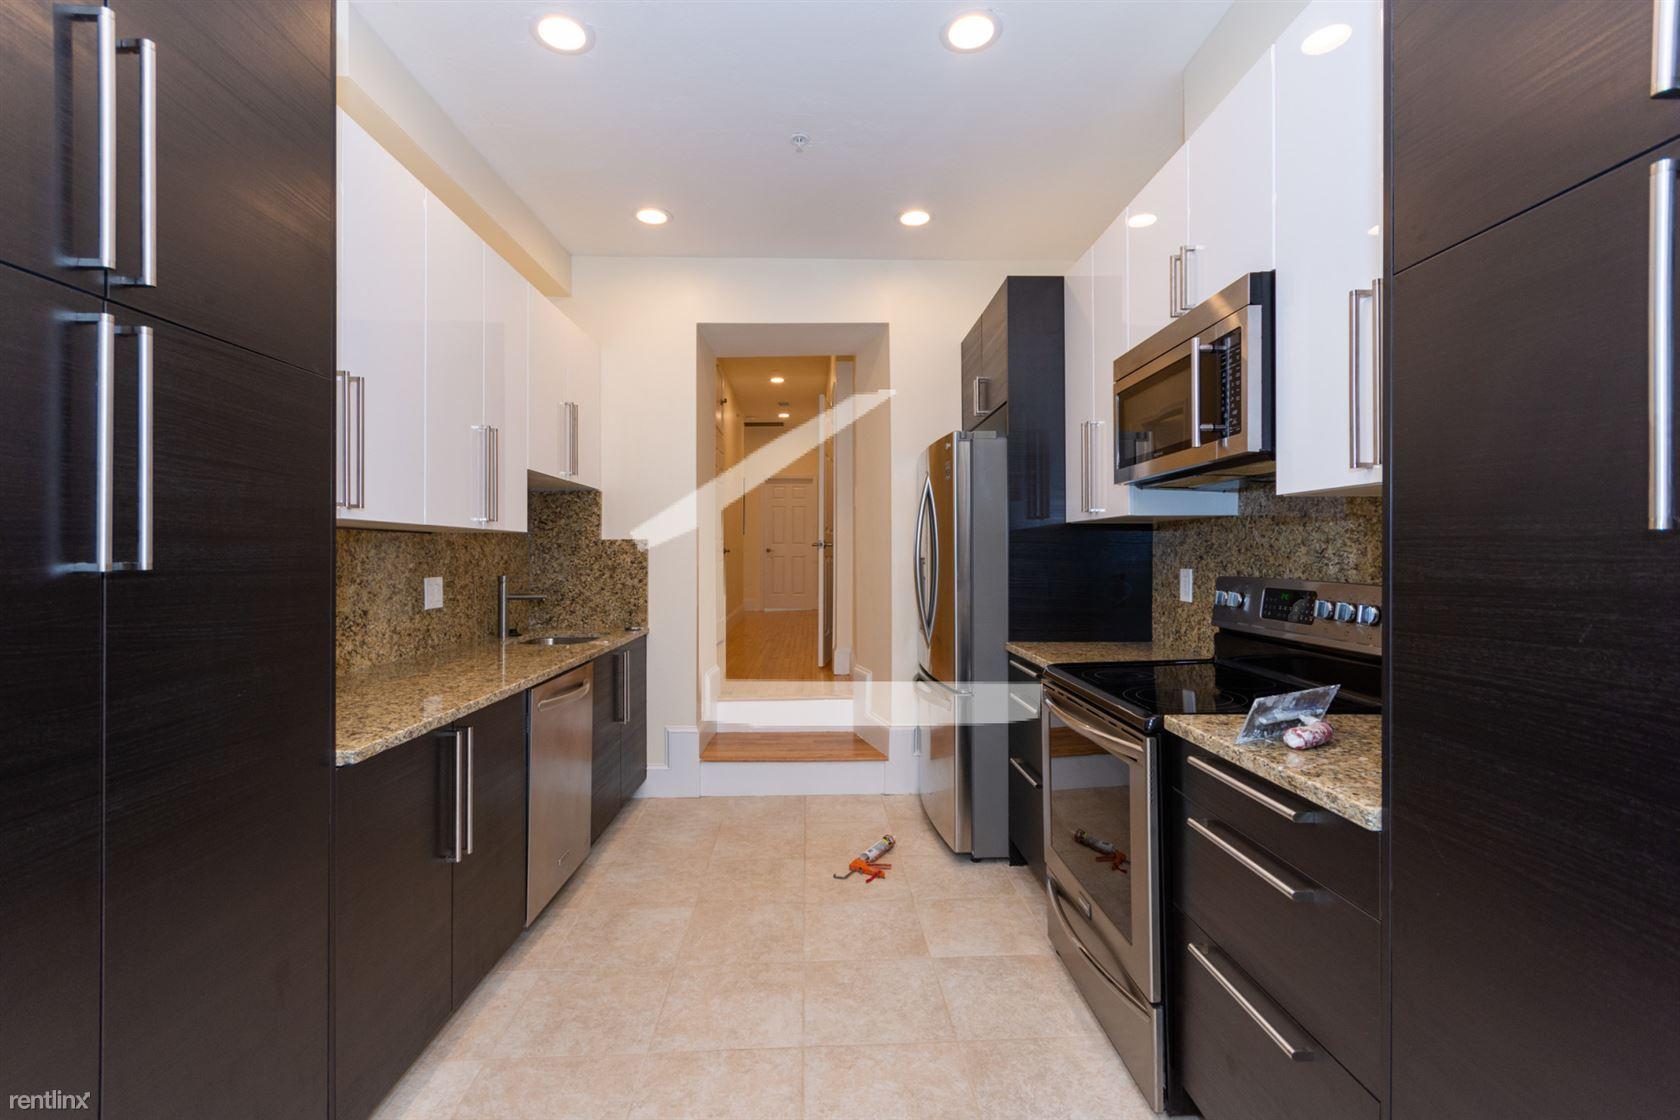 1032 Commonwealth Ave Apt 2A, Boston, MA - $6,000